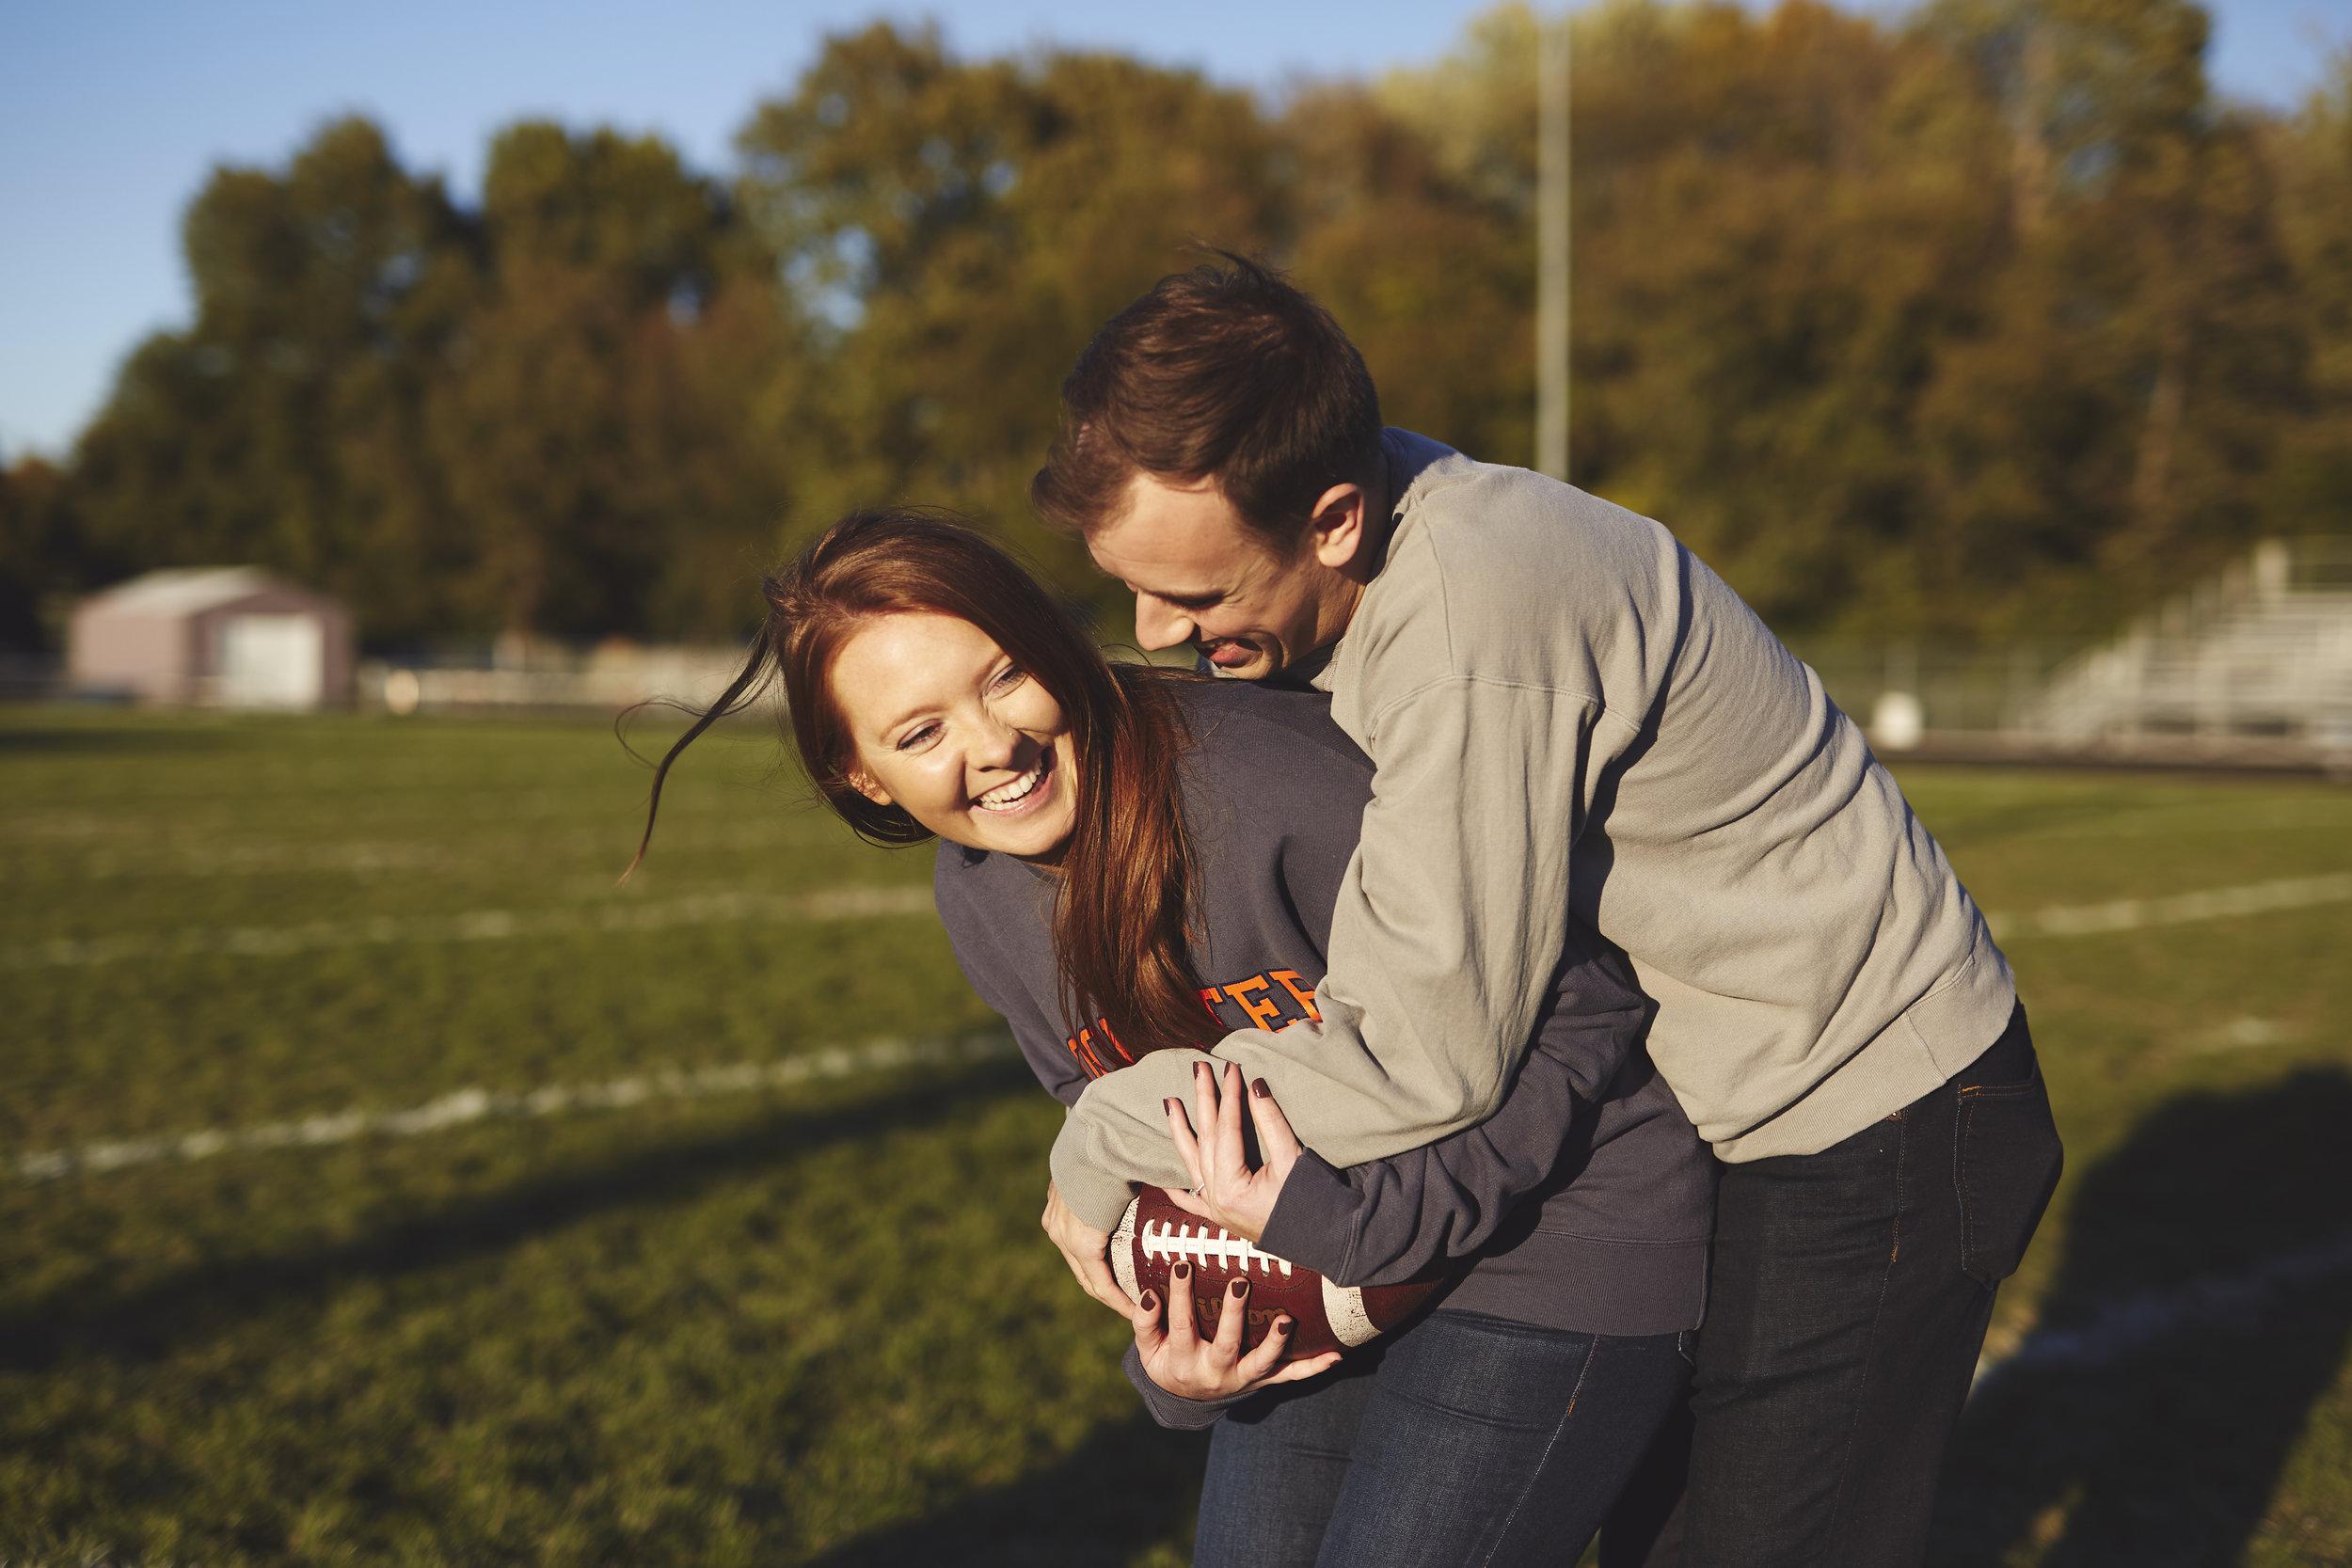 football theme engagement portrait